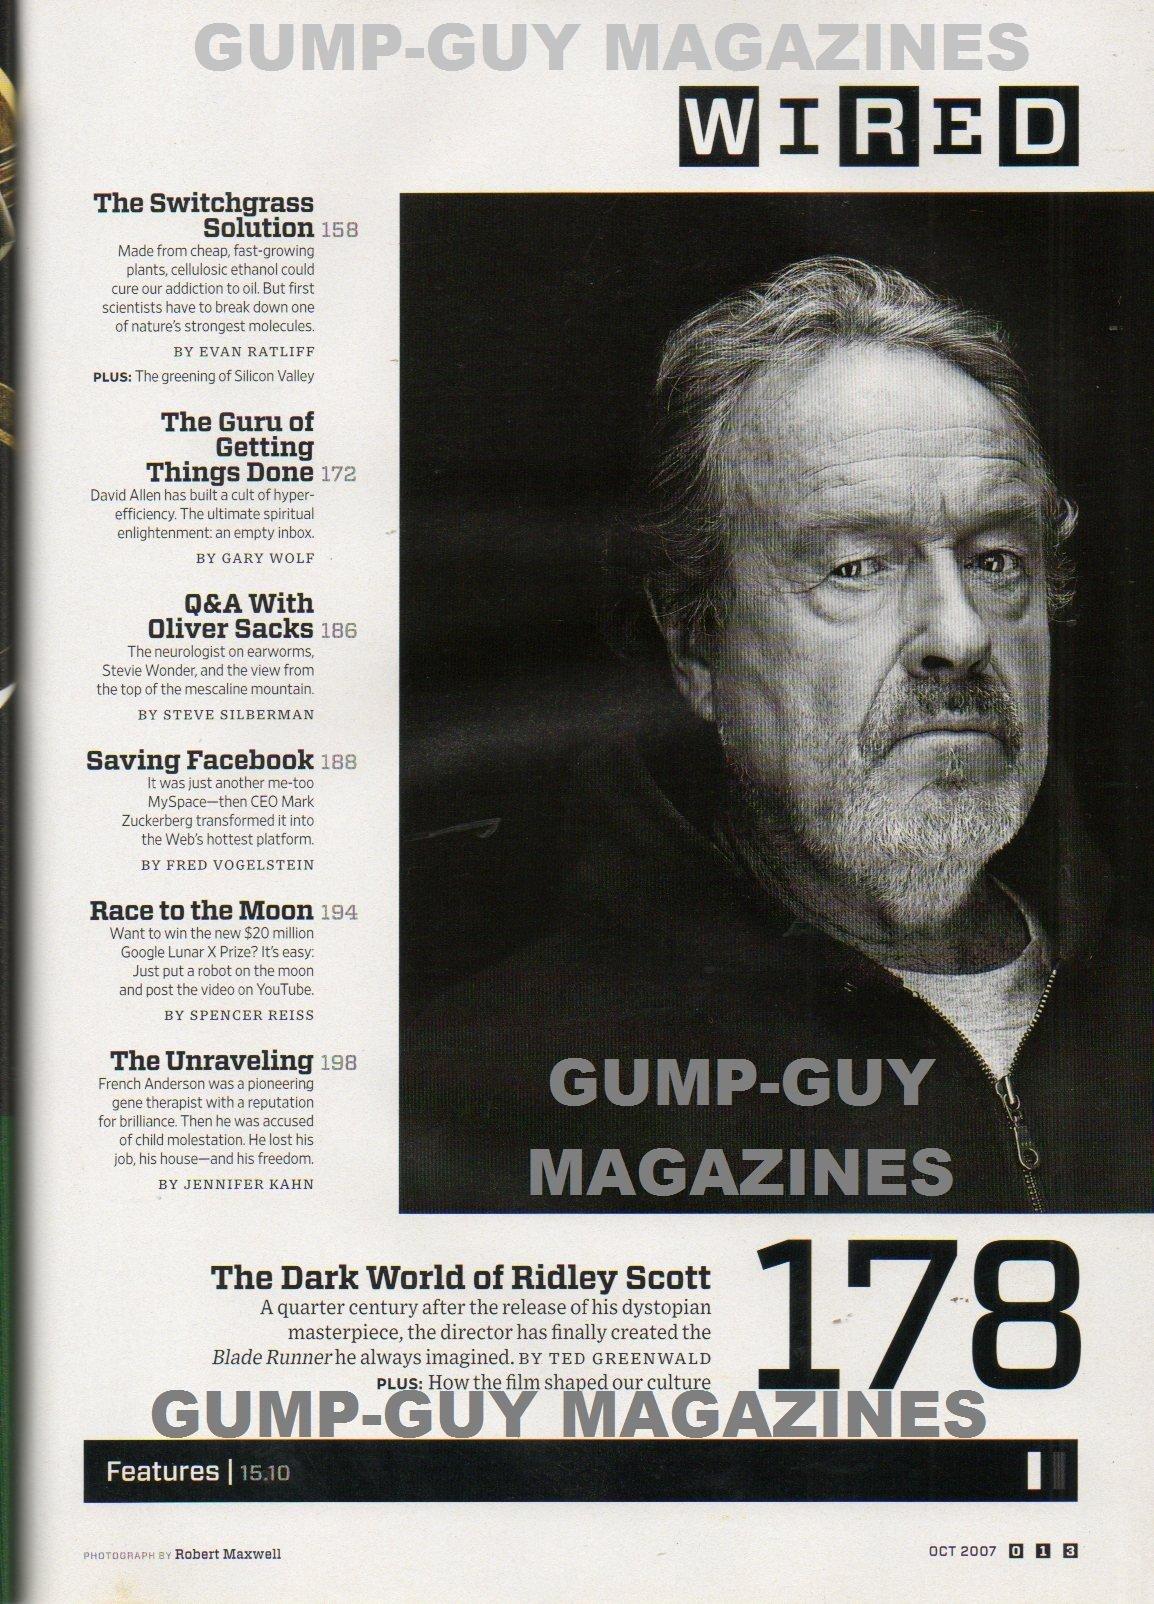 Wired Magazine 2007 THE DARK WORLD OF RIDLEY SCOTT: HOW BLADE RUNNER ...